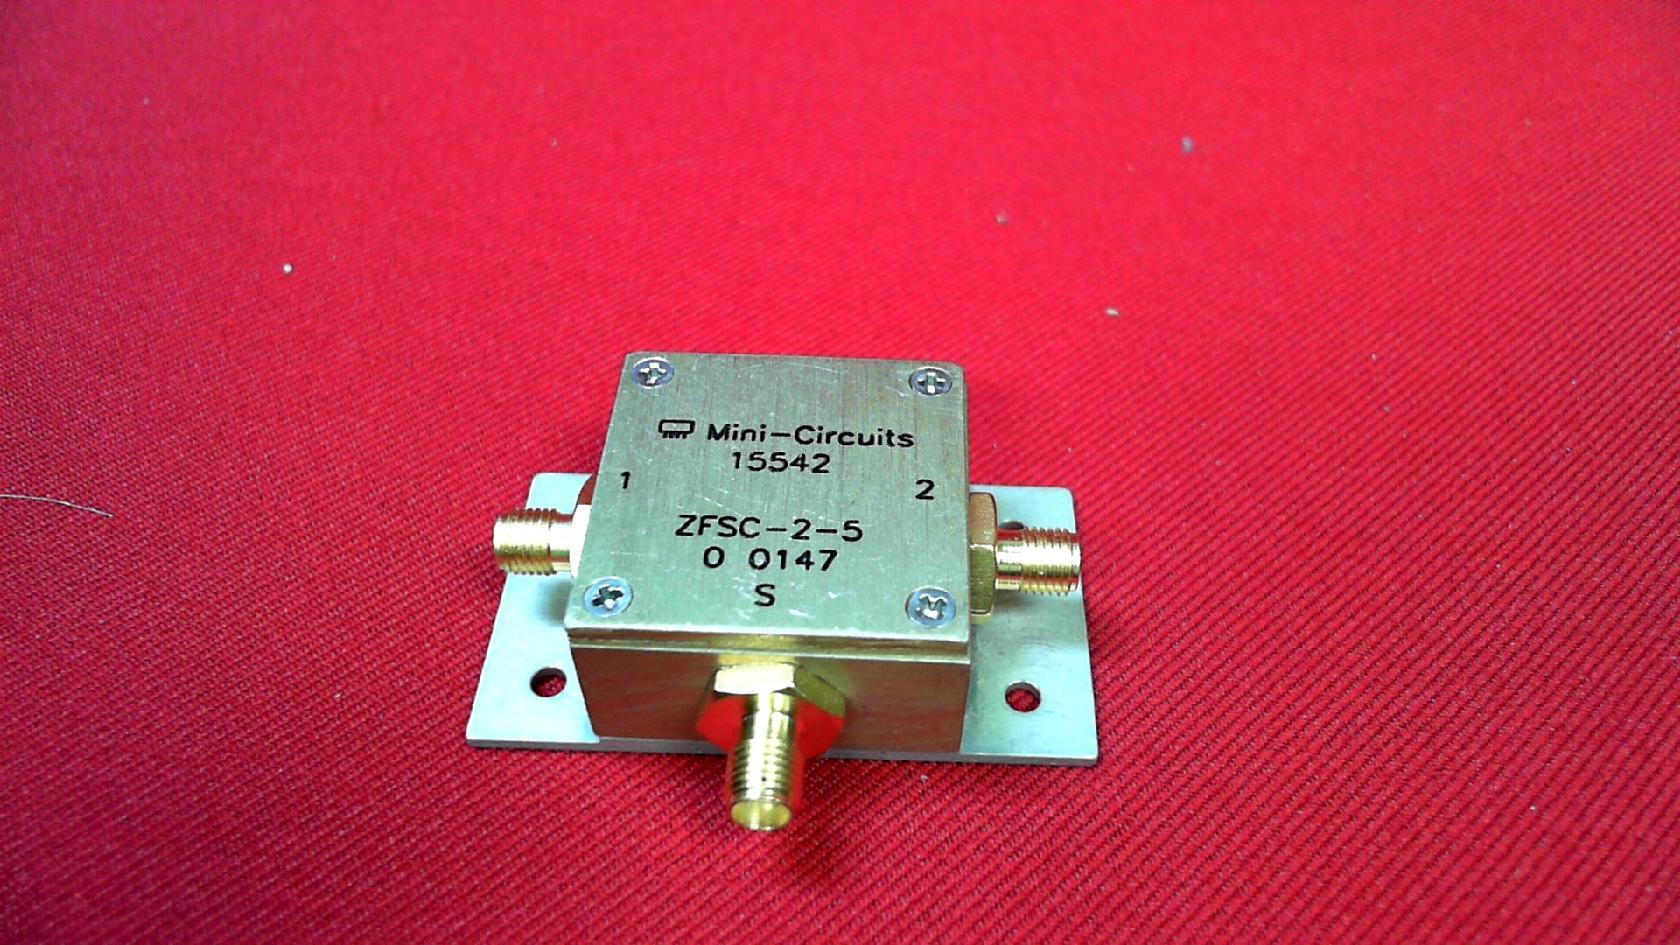 Details about Mini-circuits ZFSC-2-5 Power Splitter